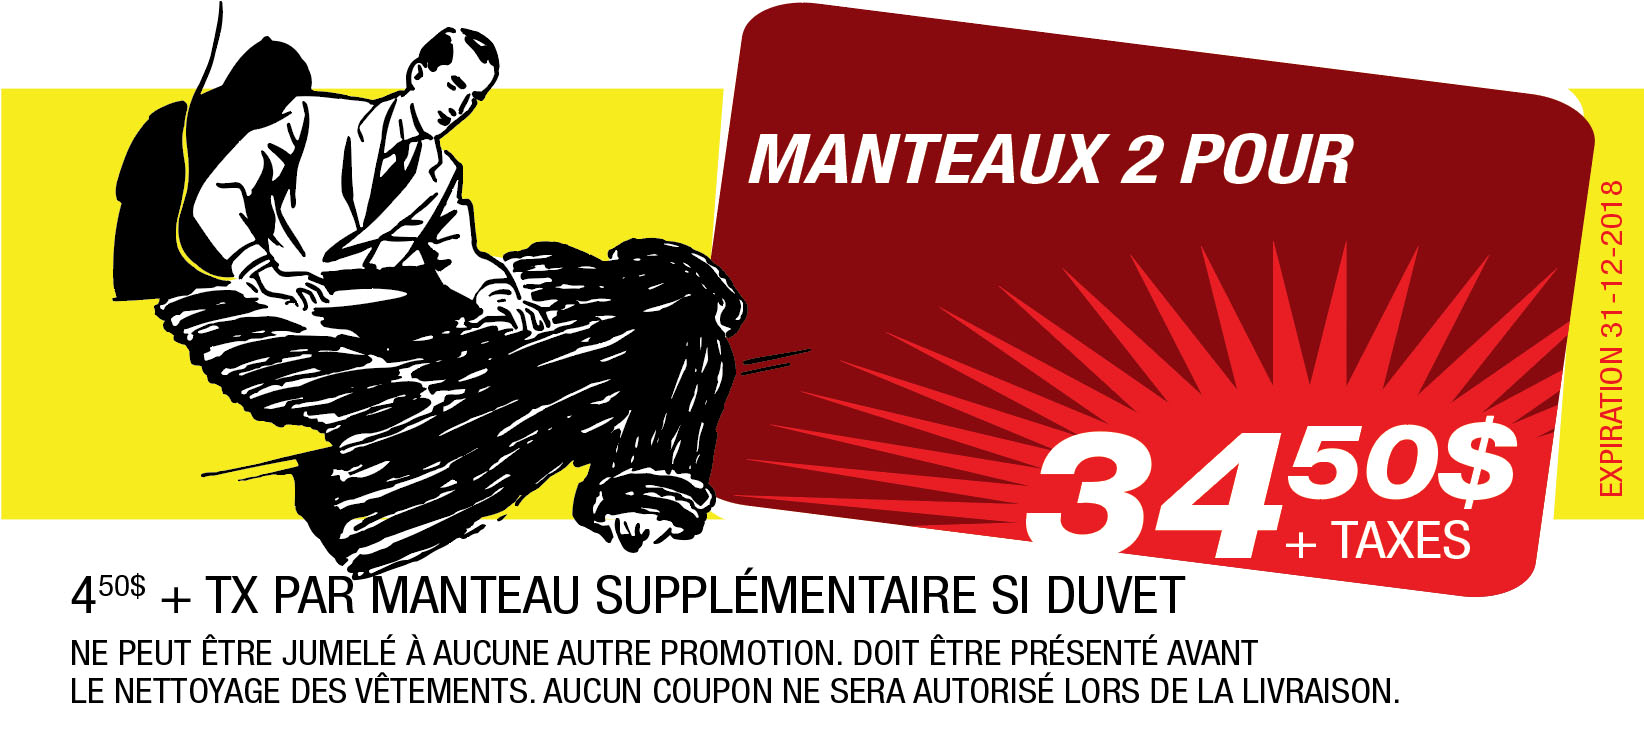 NettoyeurEclair-Manteaux-Expiration31082018